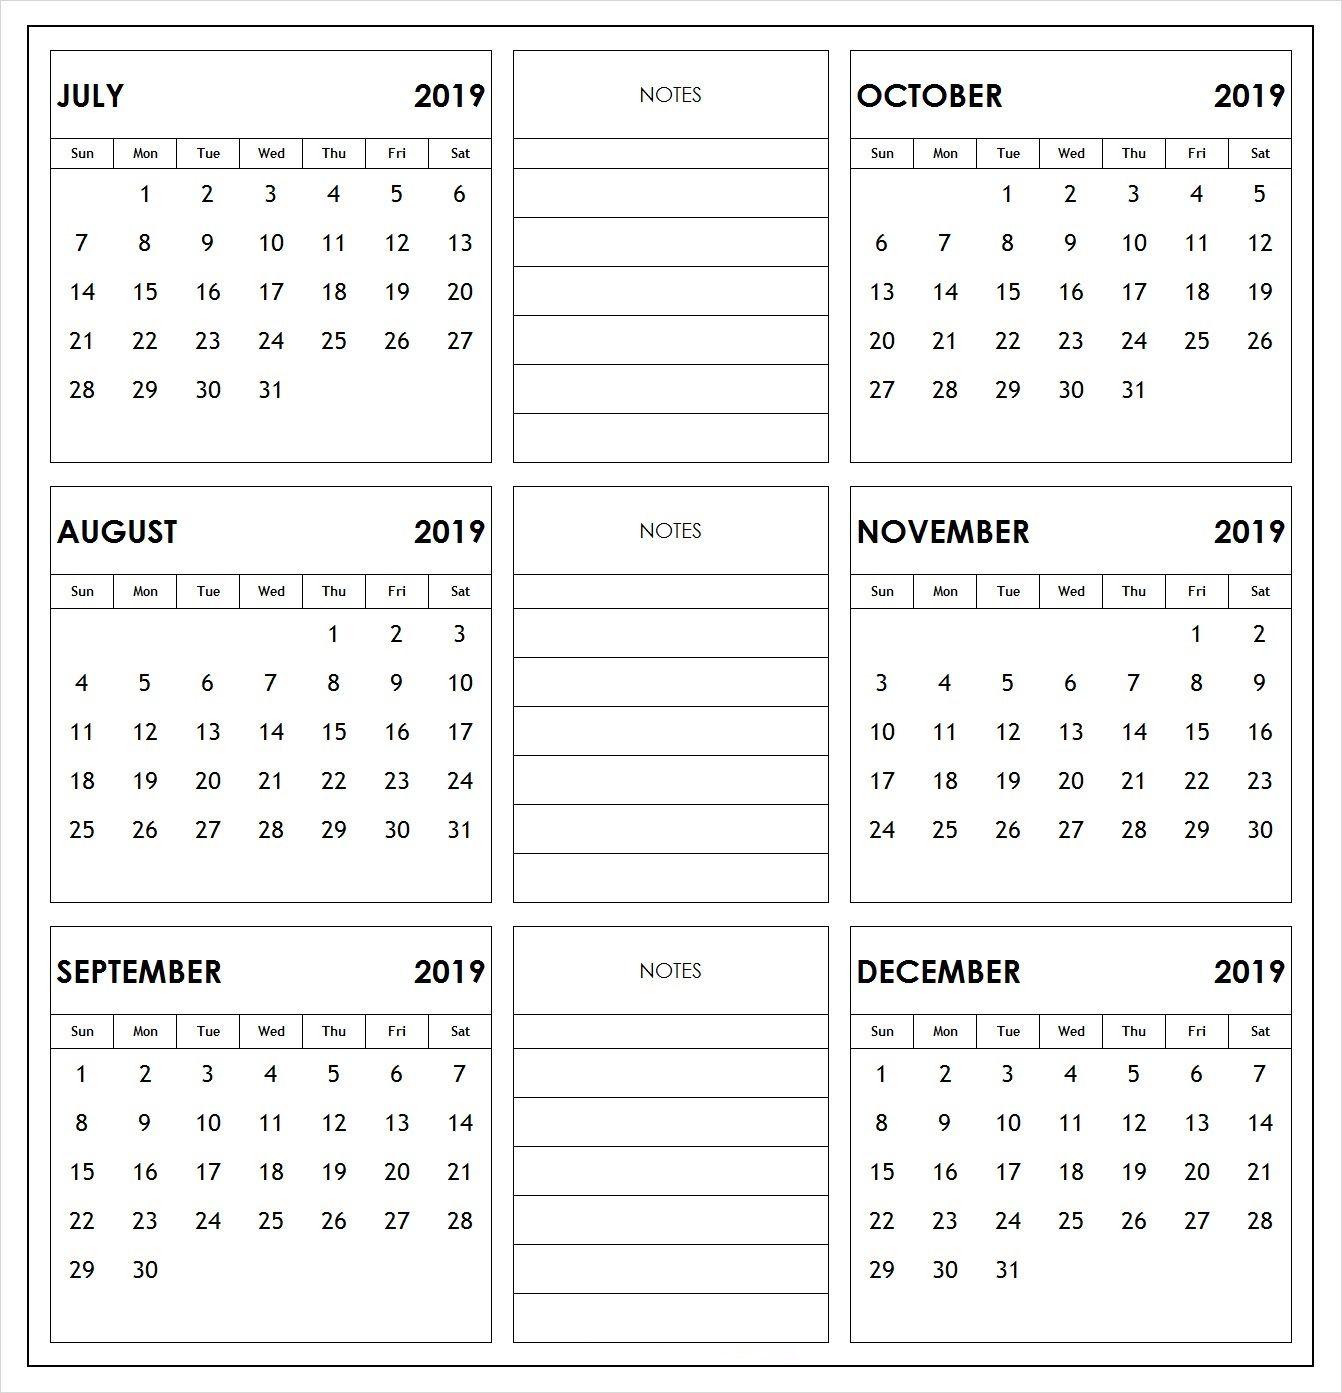 2019 Half Year Print Calendar | Print Calendar, 2019